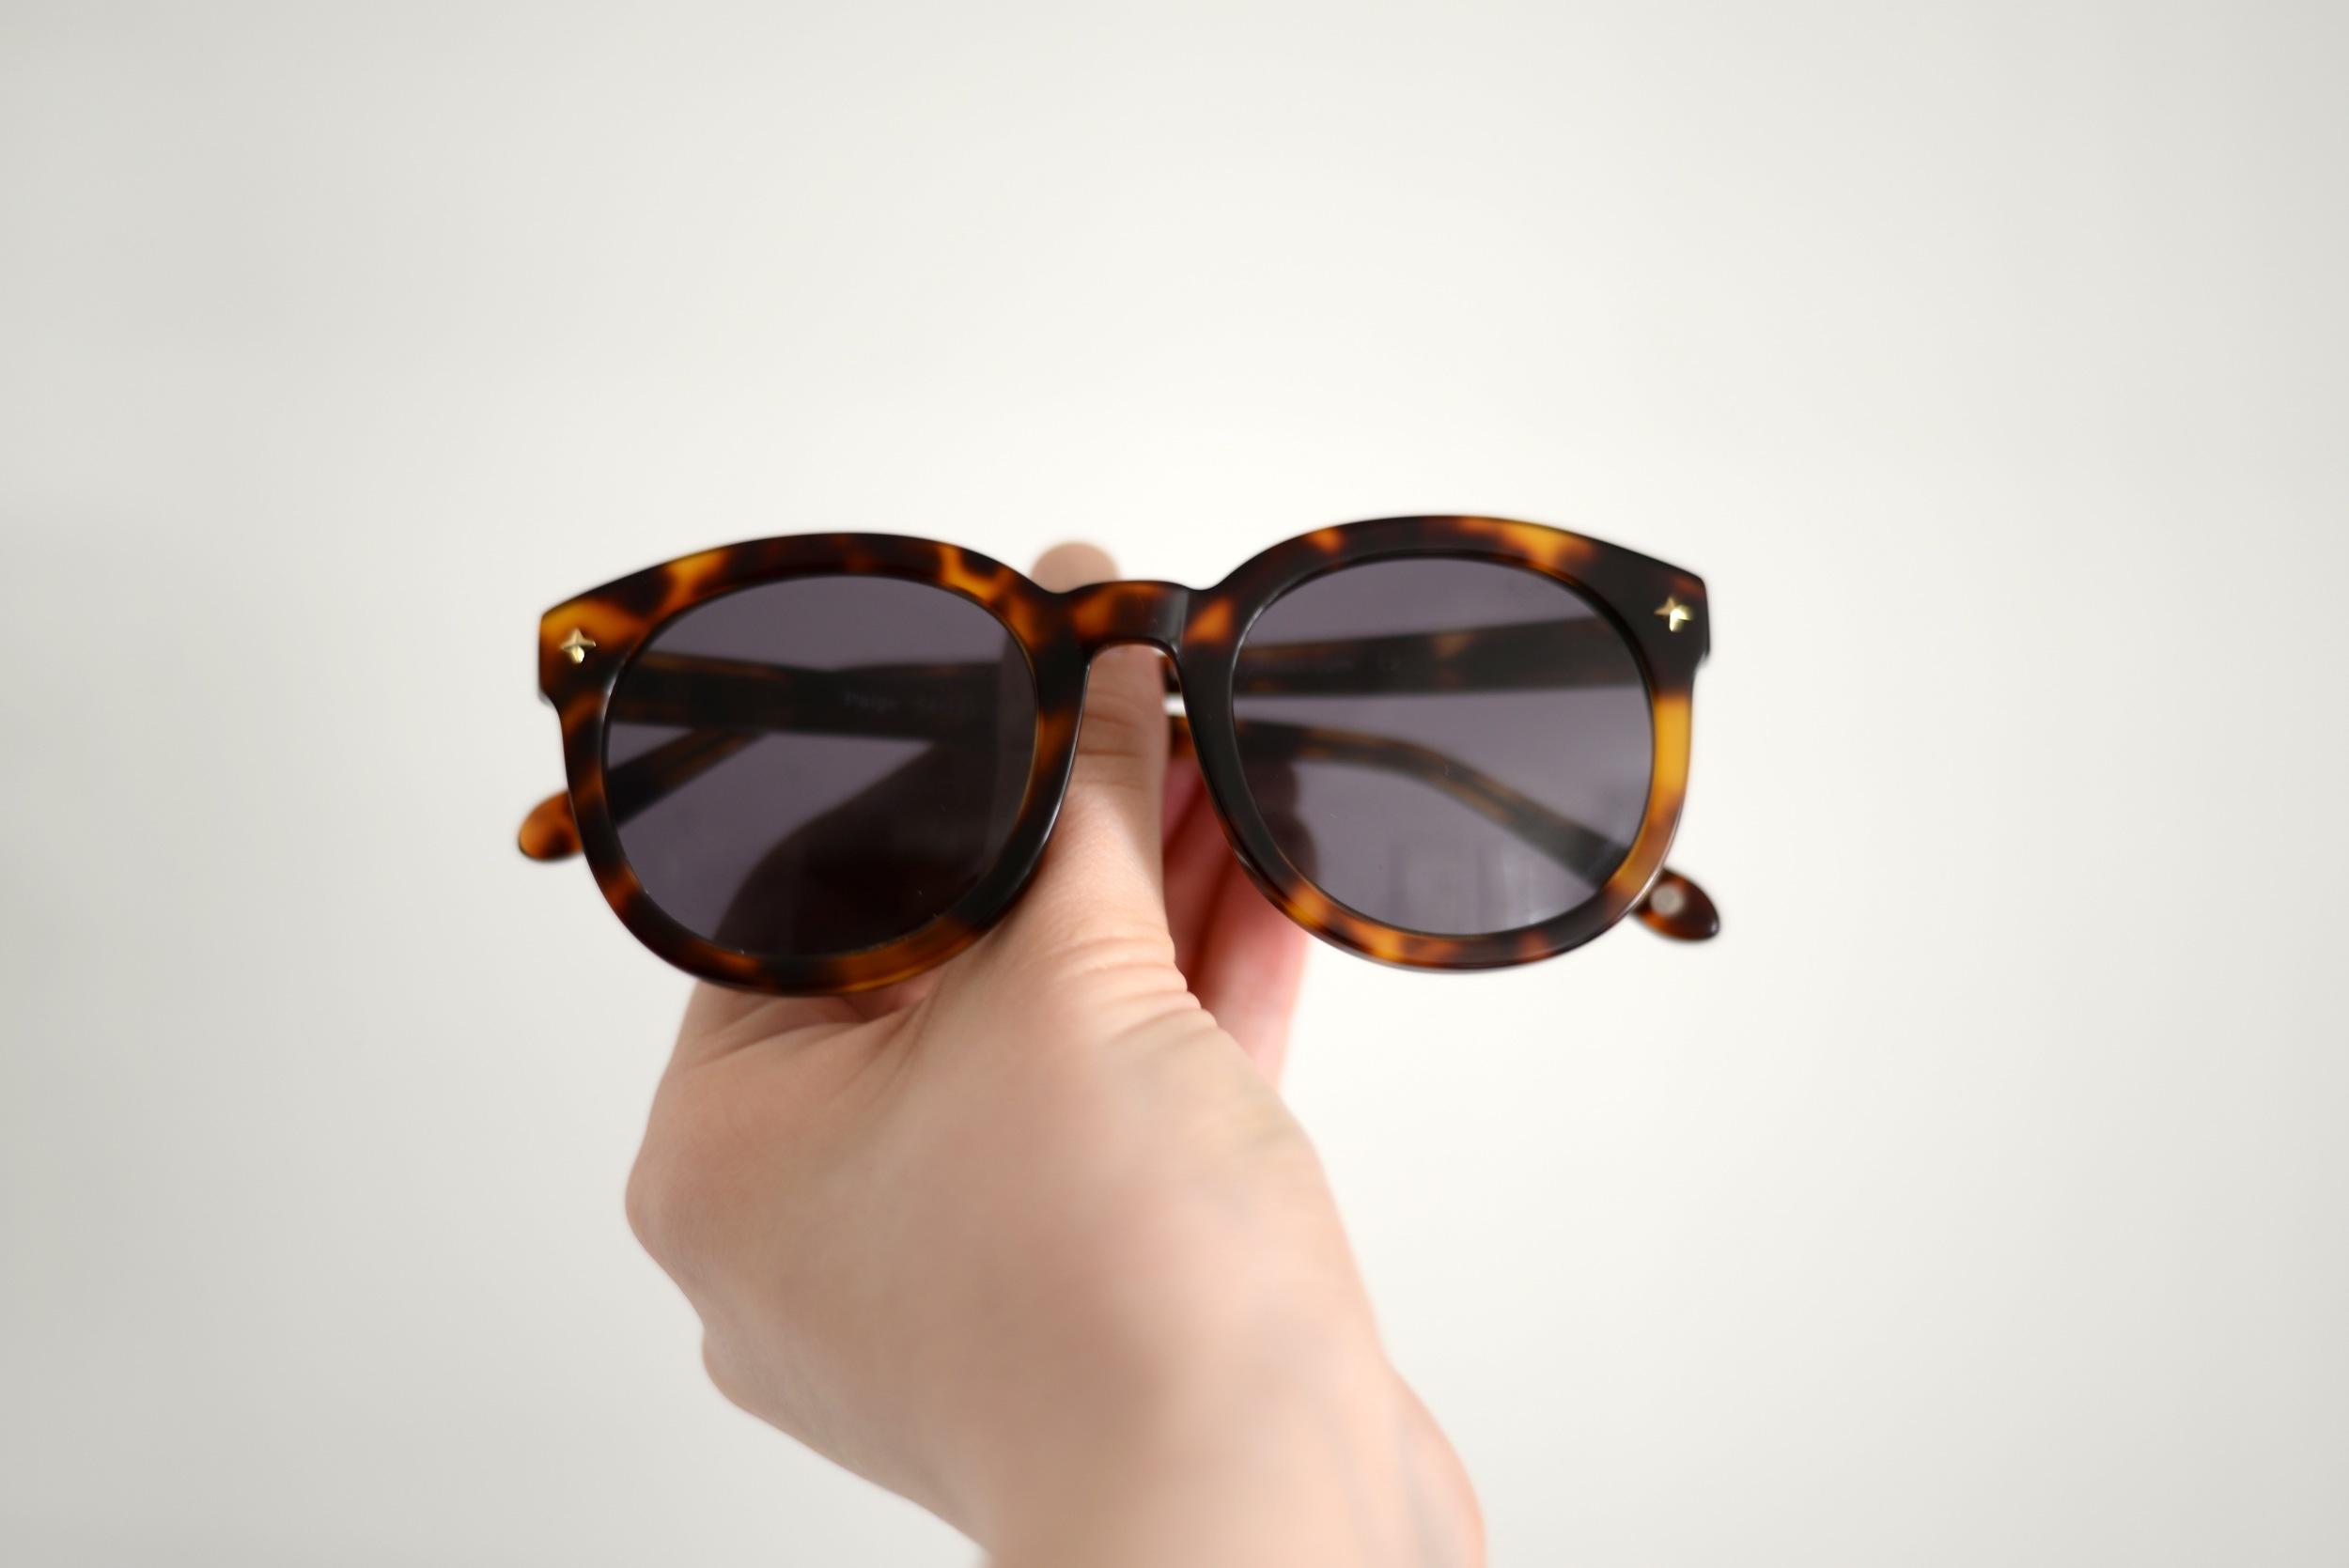 Eye Buy Direct Sunglasses